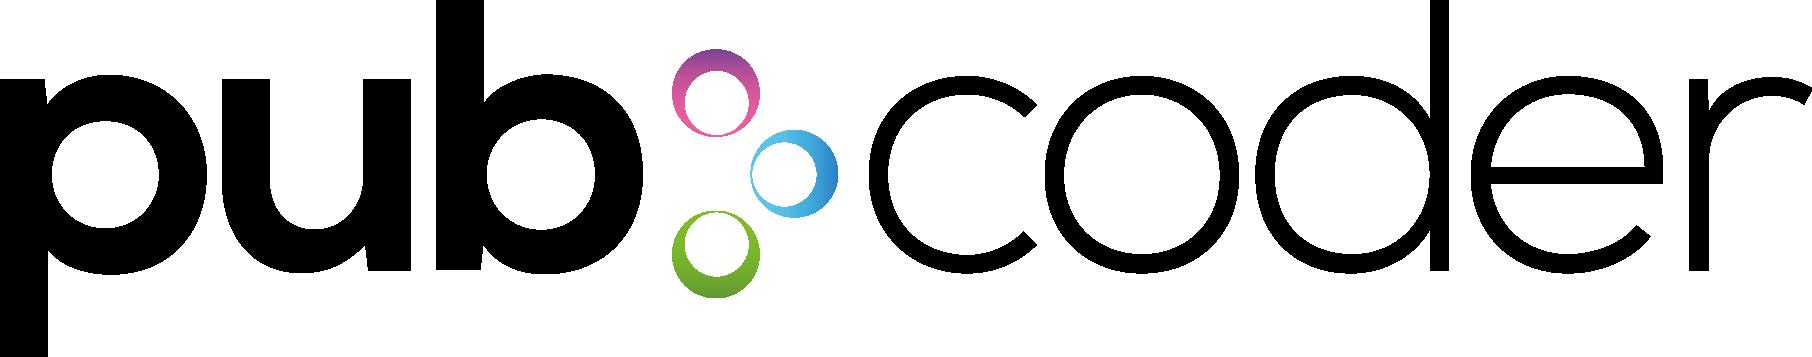 PubCoder Logo